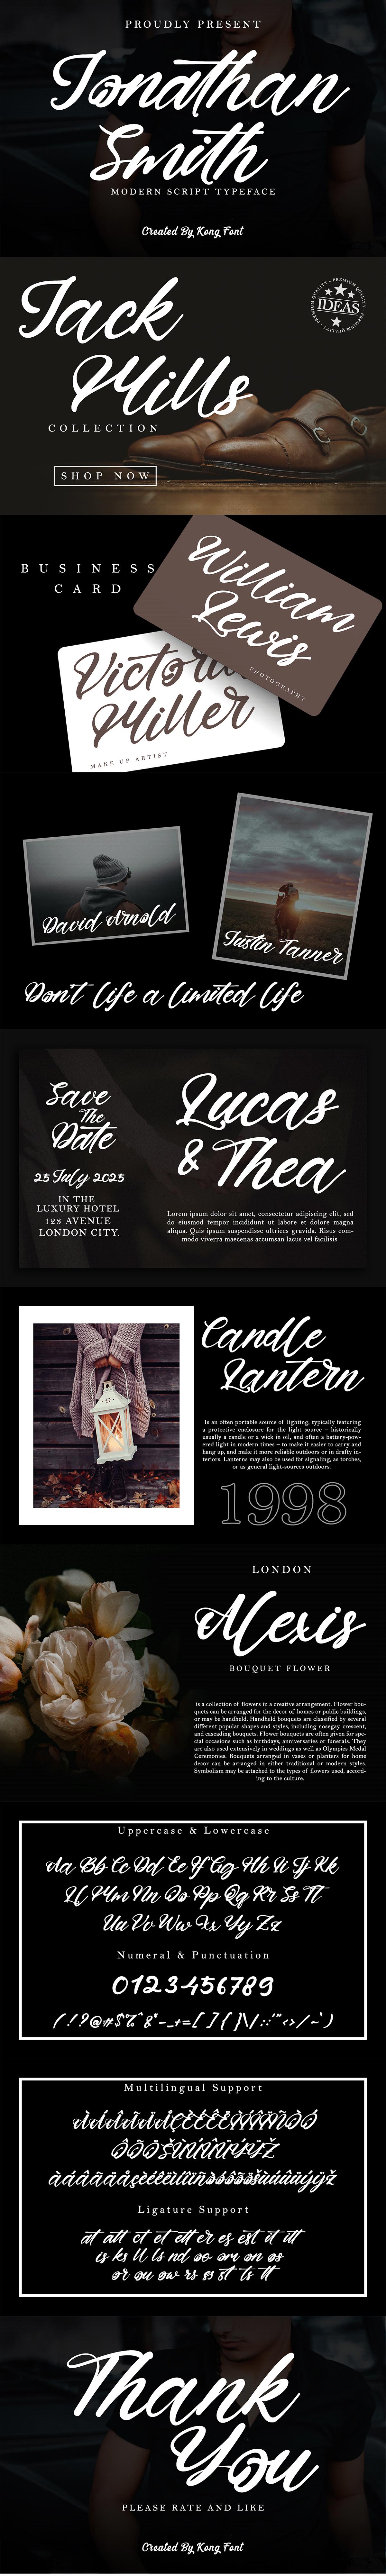 branding  designfont font greetingcard jonathan smith lettering Logotype modern Script Typeface